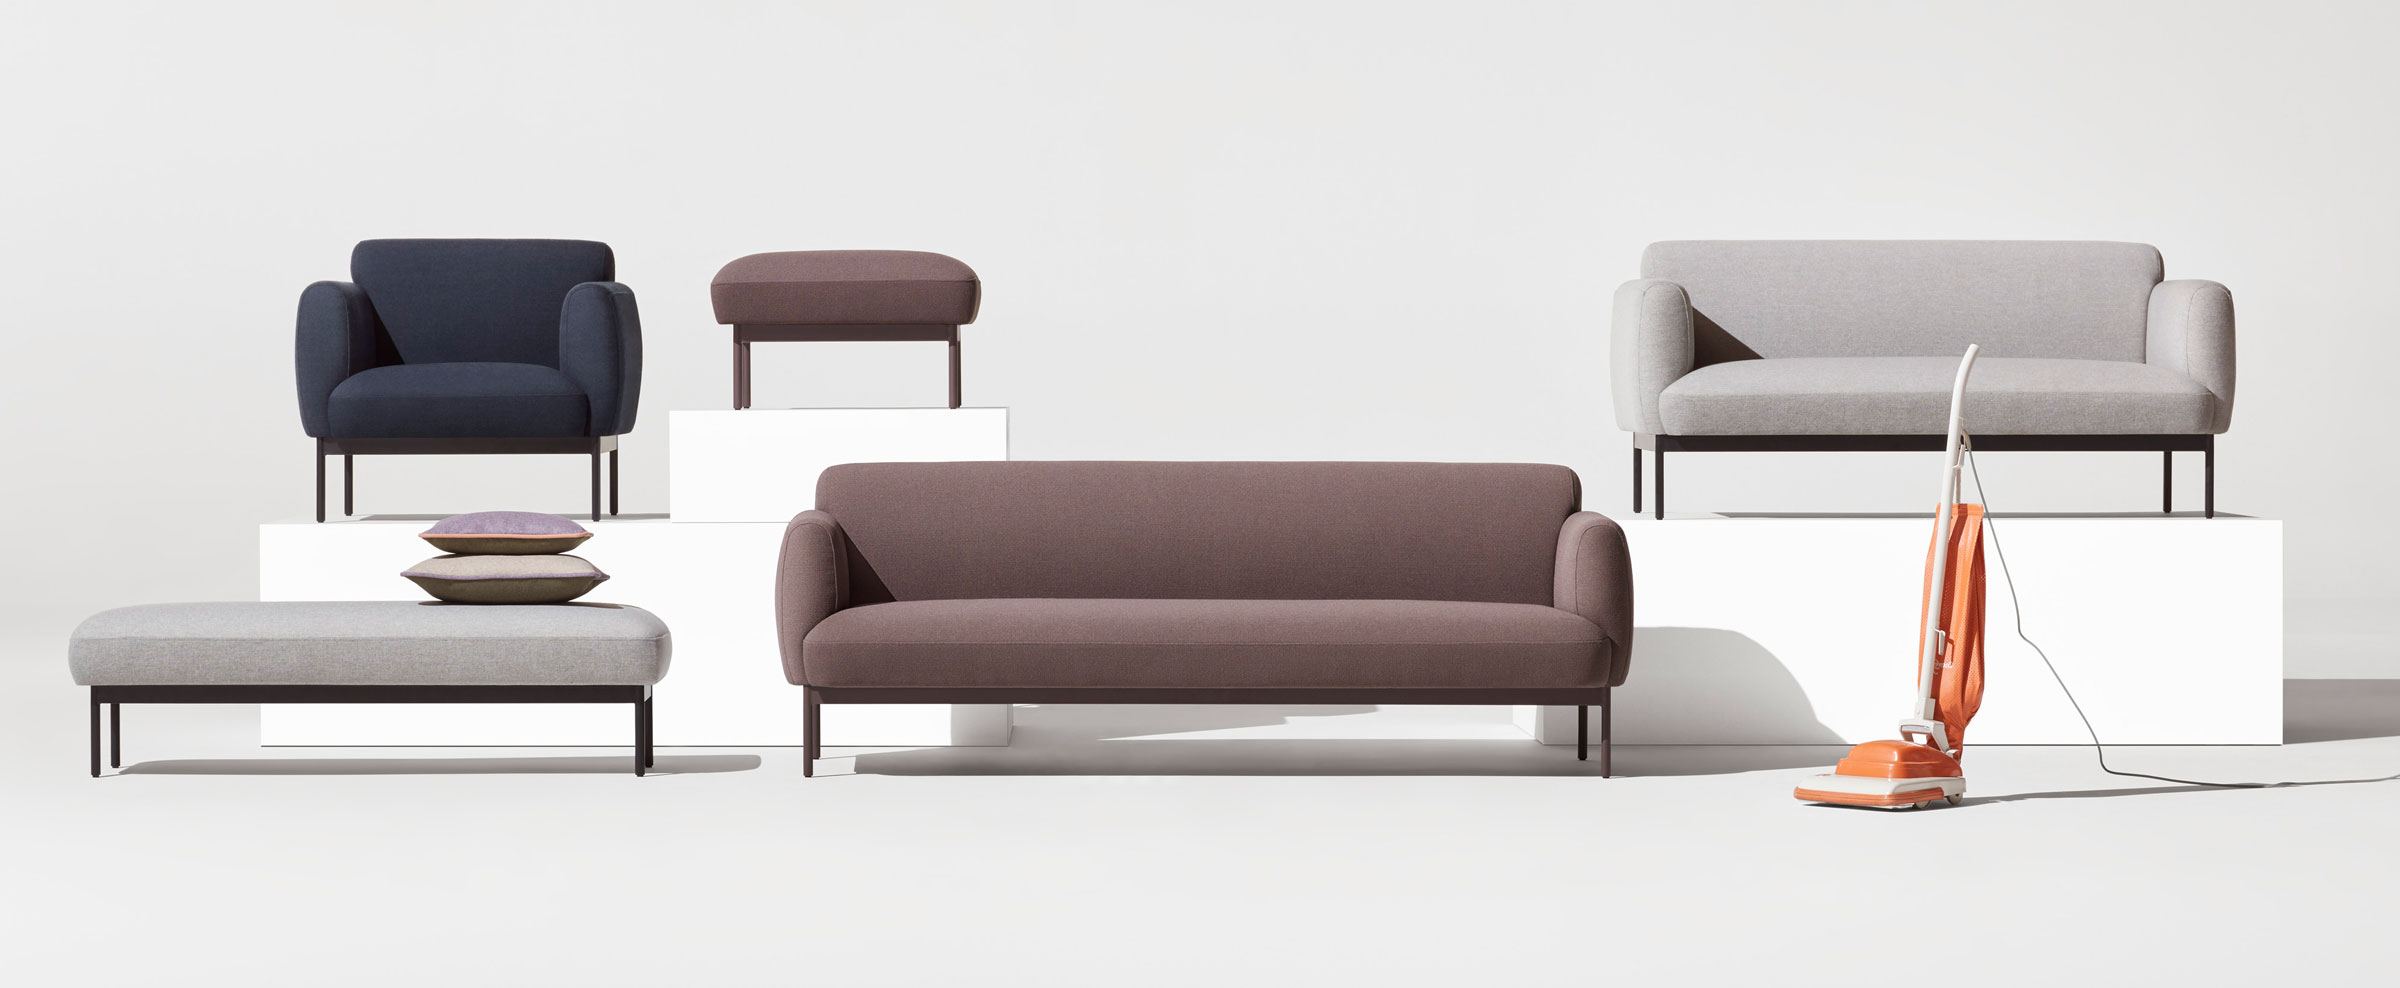 Sofas Puff Etdg Puff Puff sofa Contemporary Uphosltered sofa Blu Dot